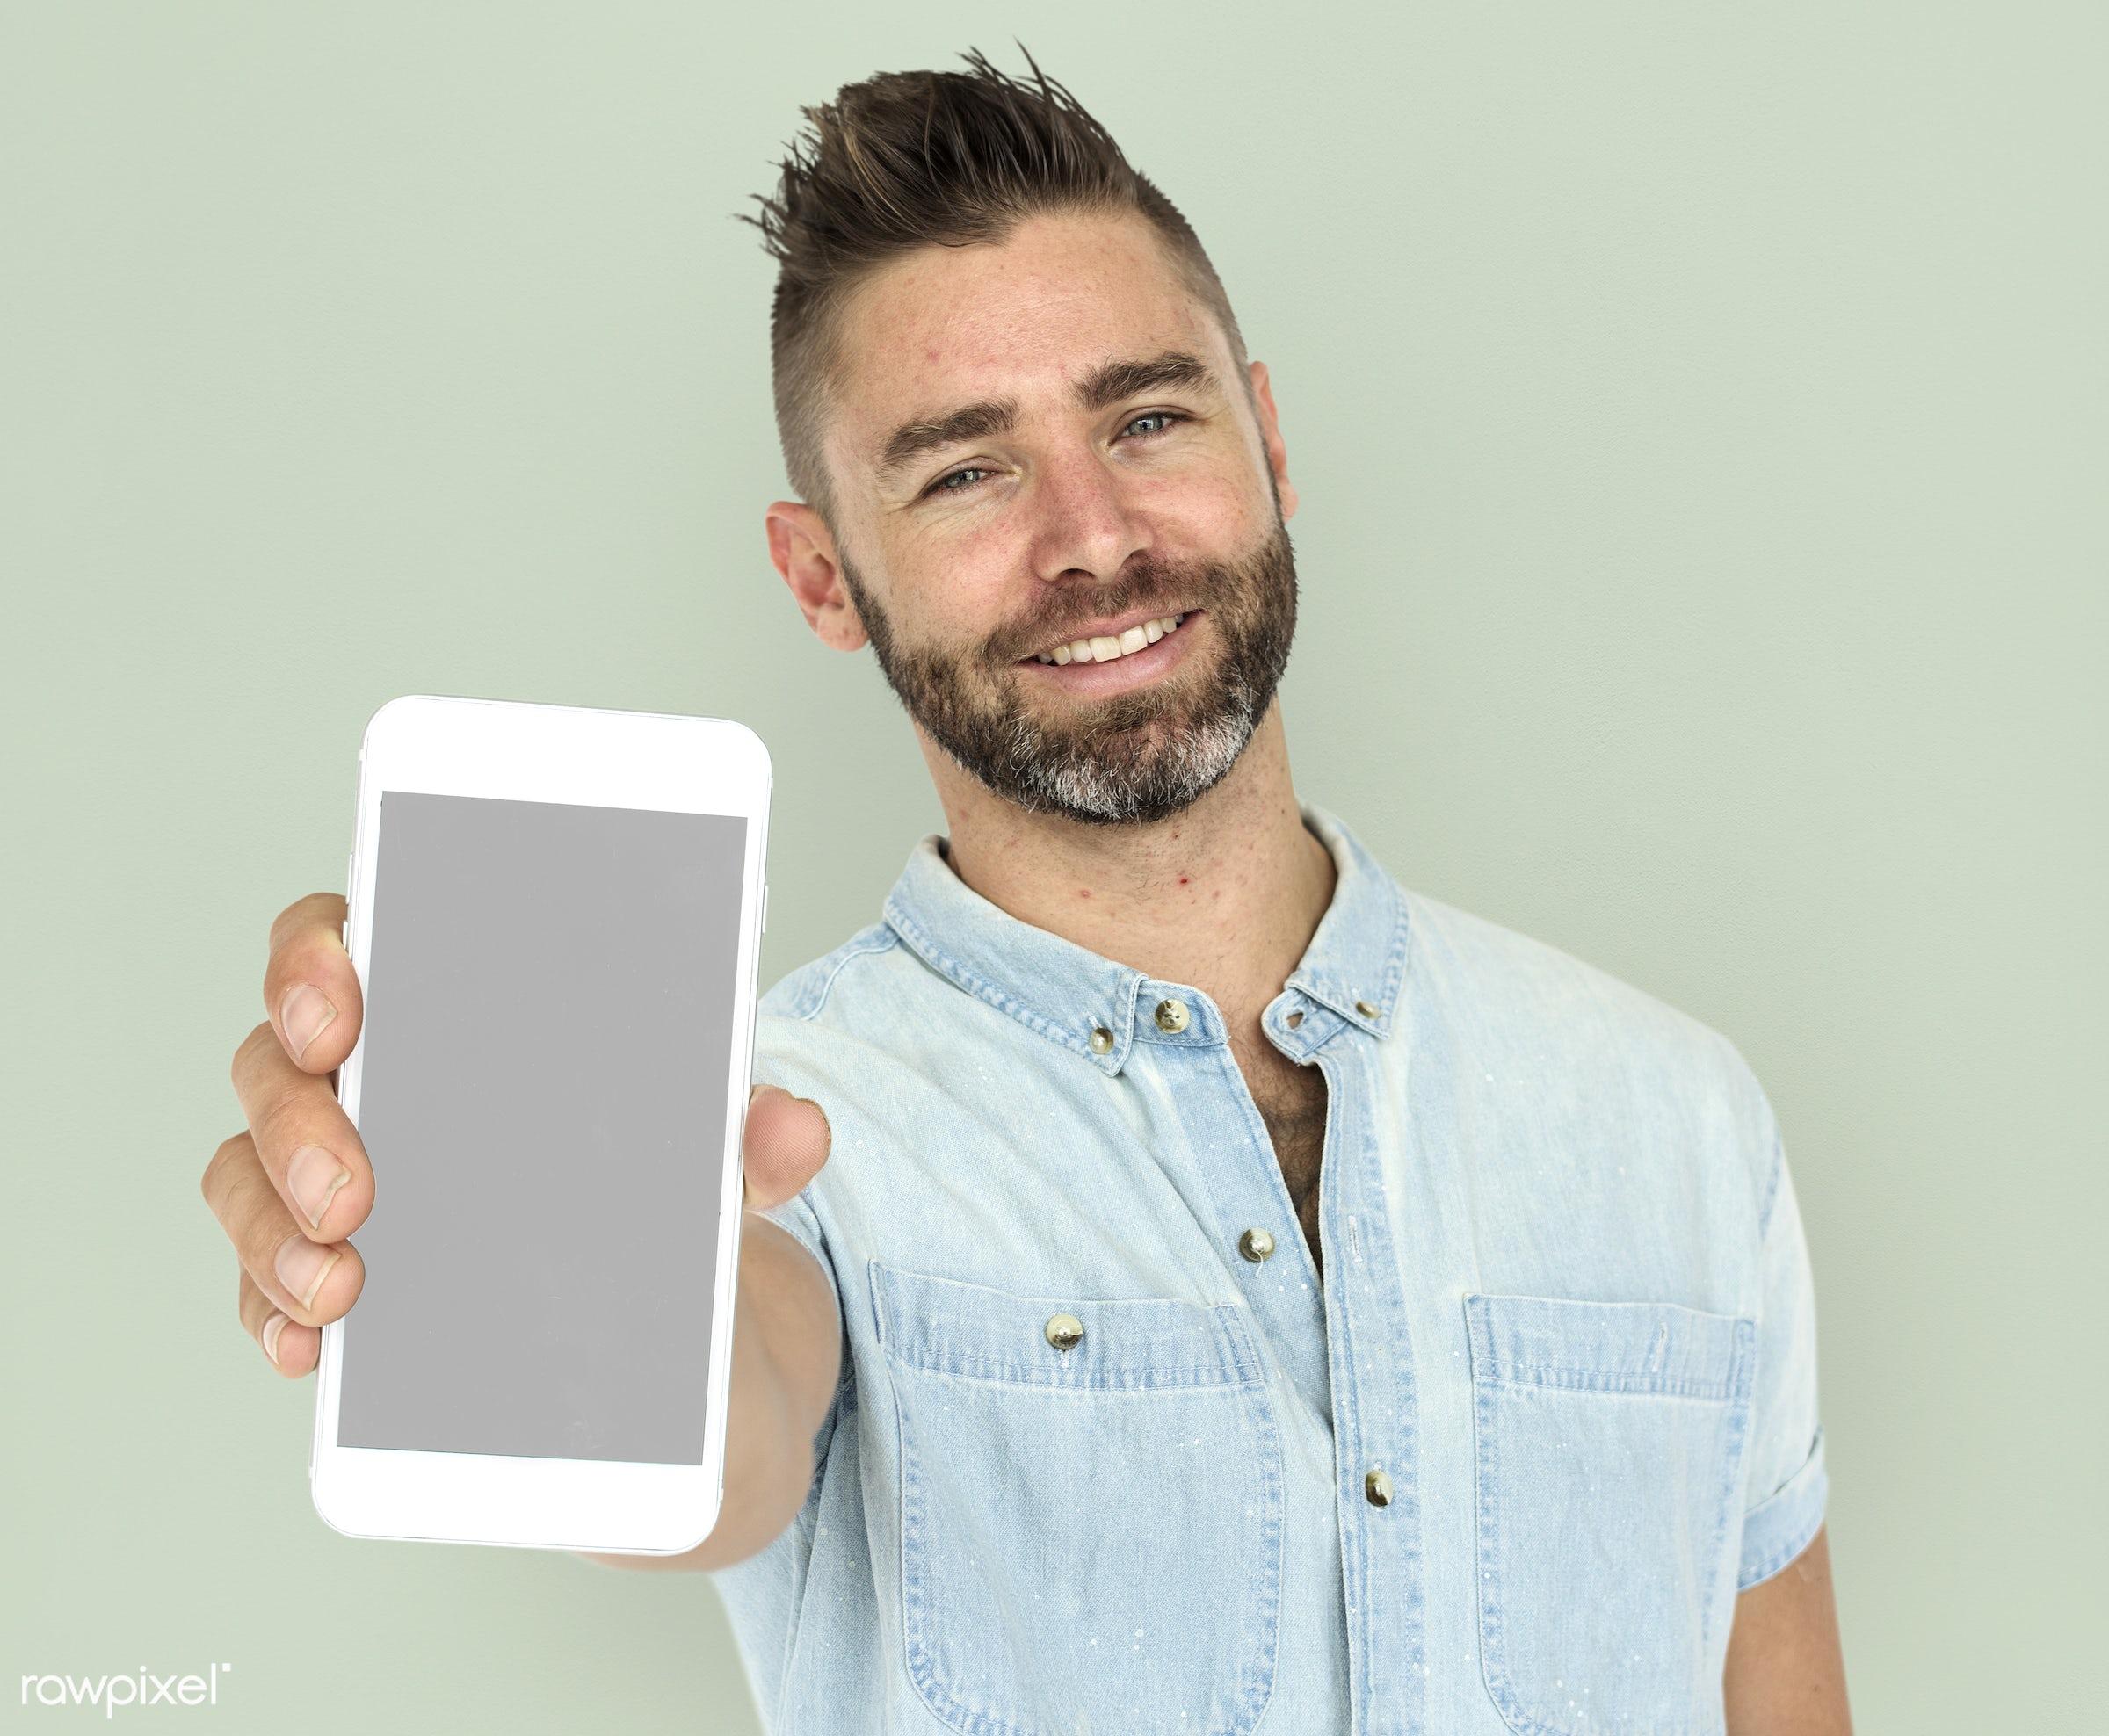 background, beard, communication, device, emotion, expression, holding, holding phone, isolated, male, man, mobile, mobile...